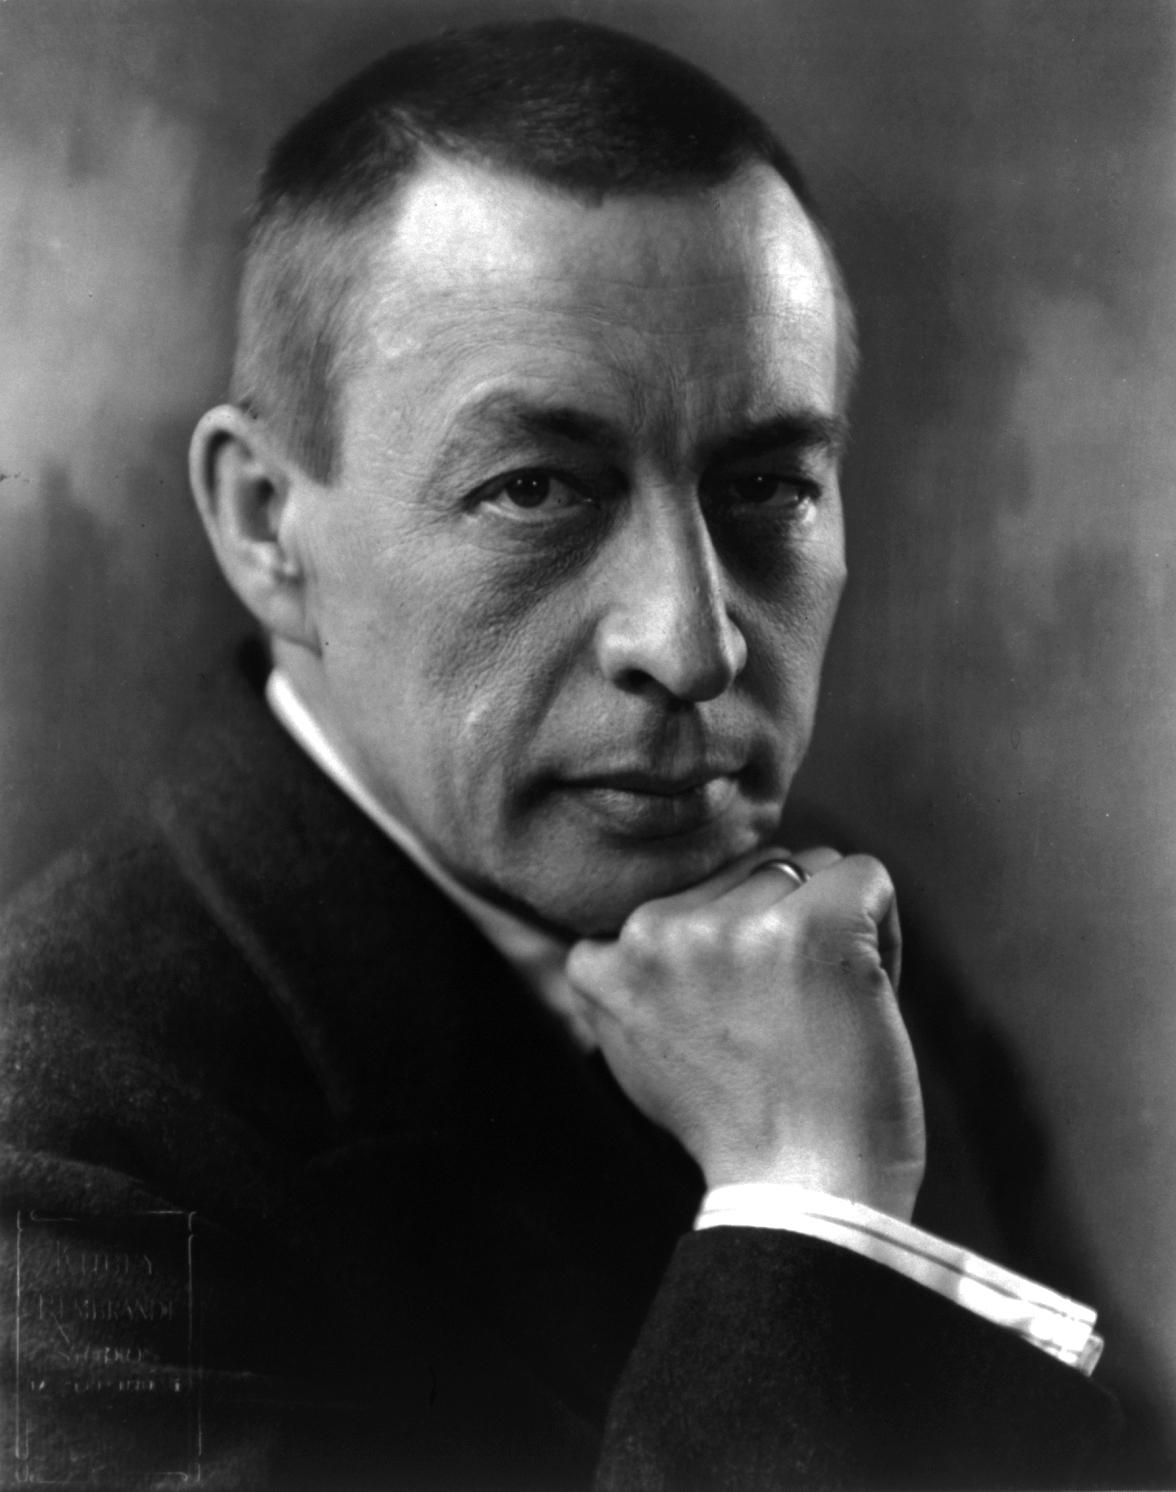 hight resolution of Sergei Rachmaninoff - Wikipedia